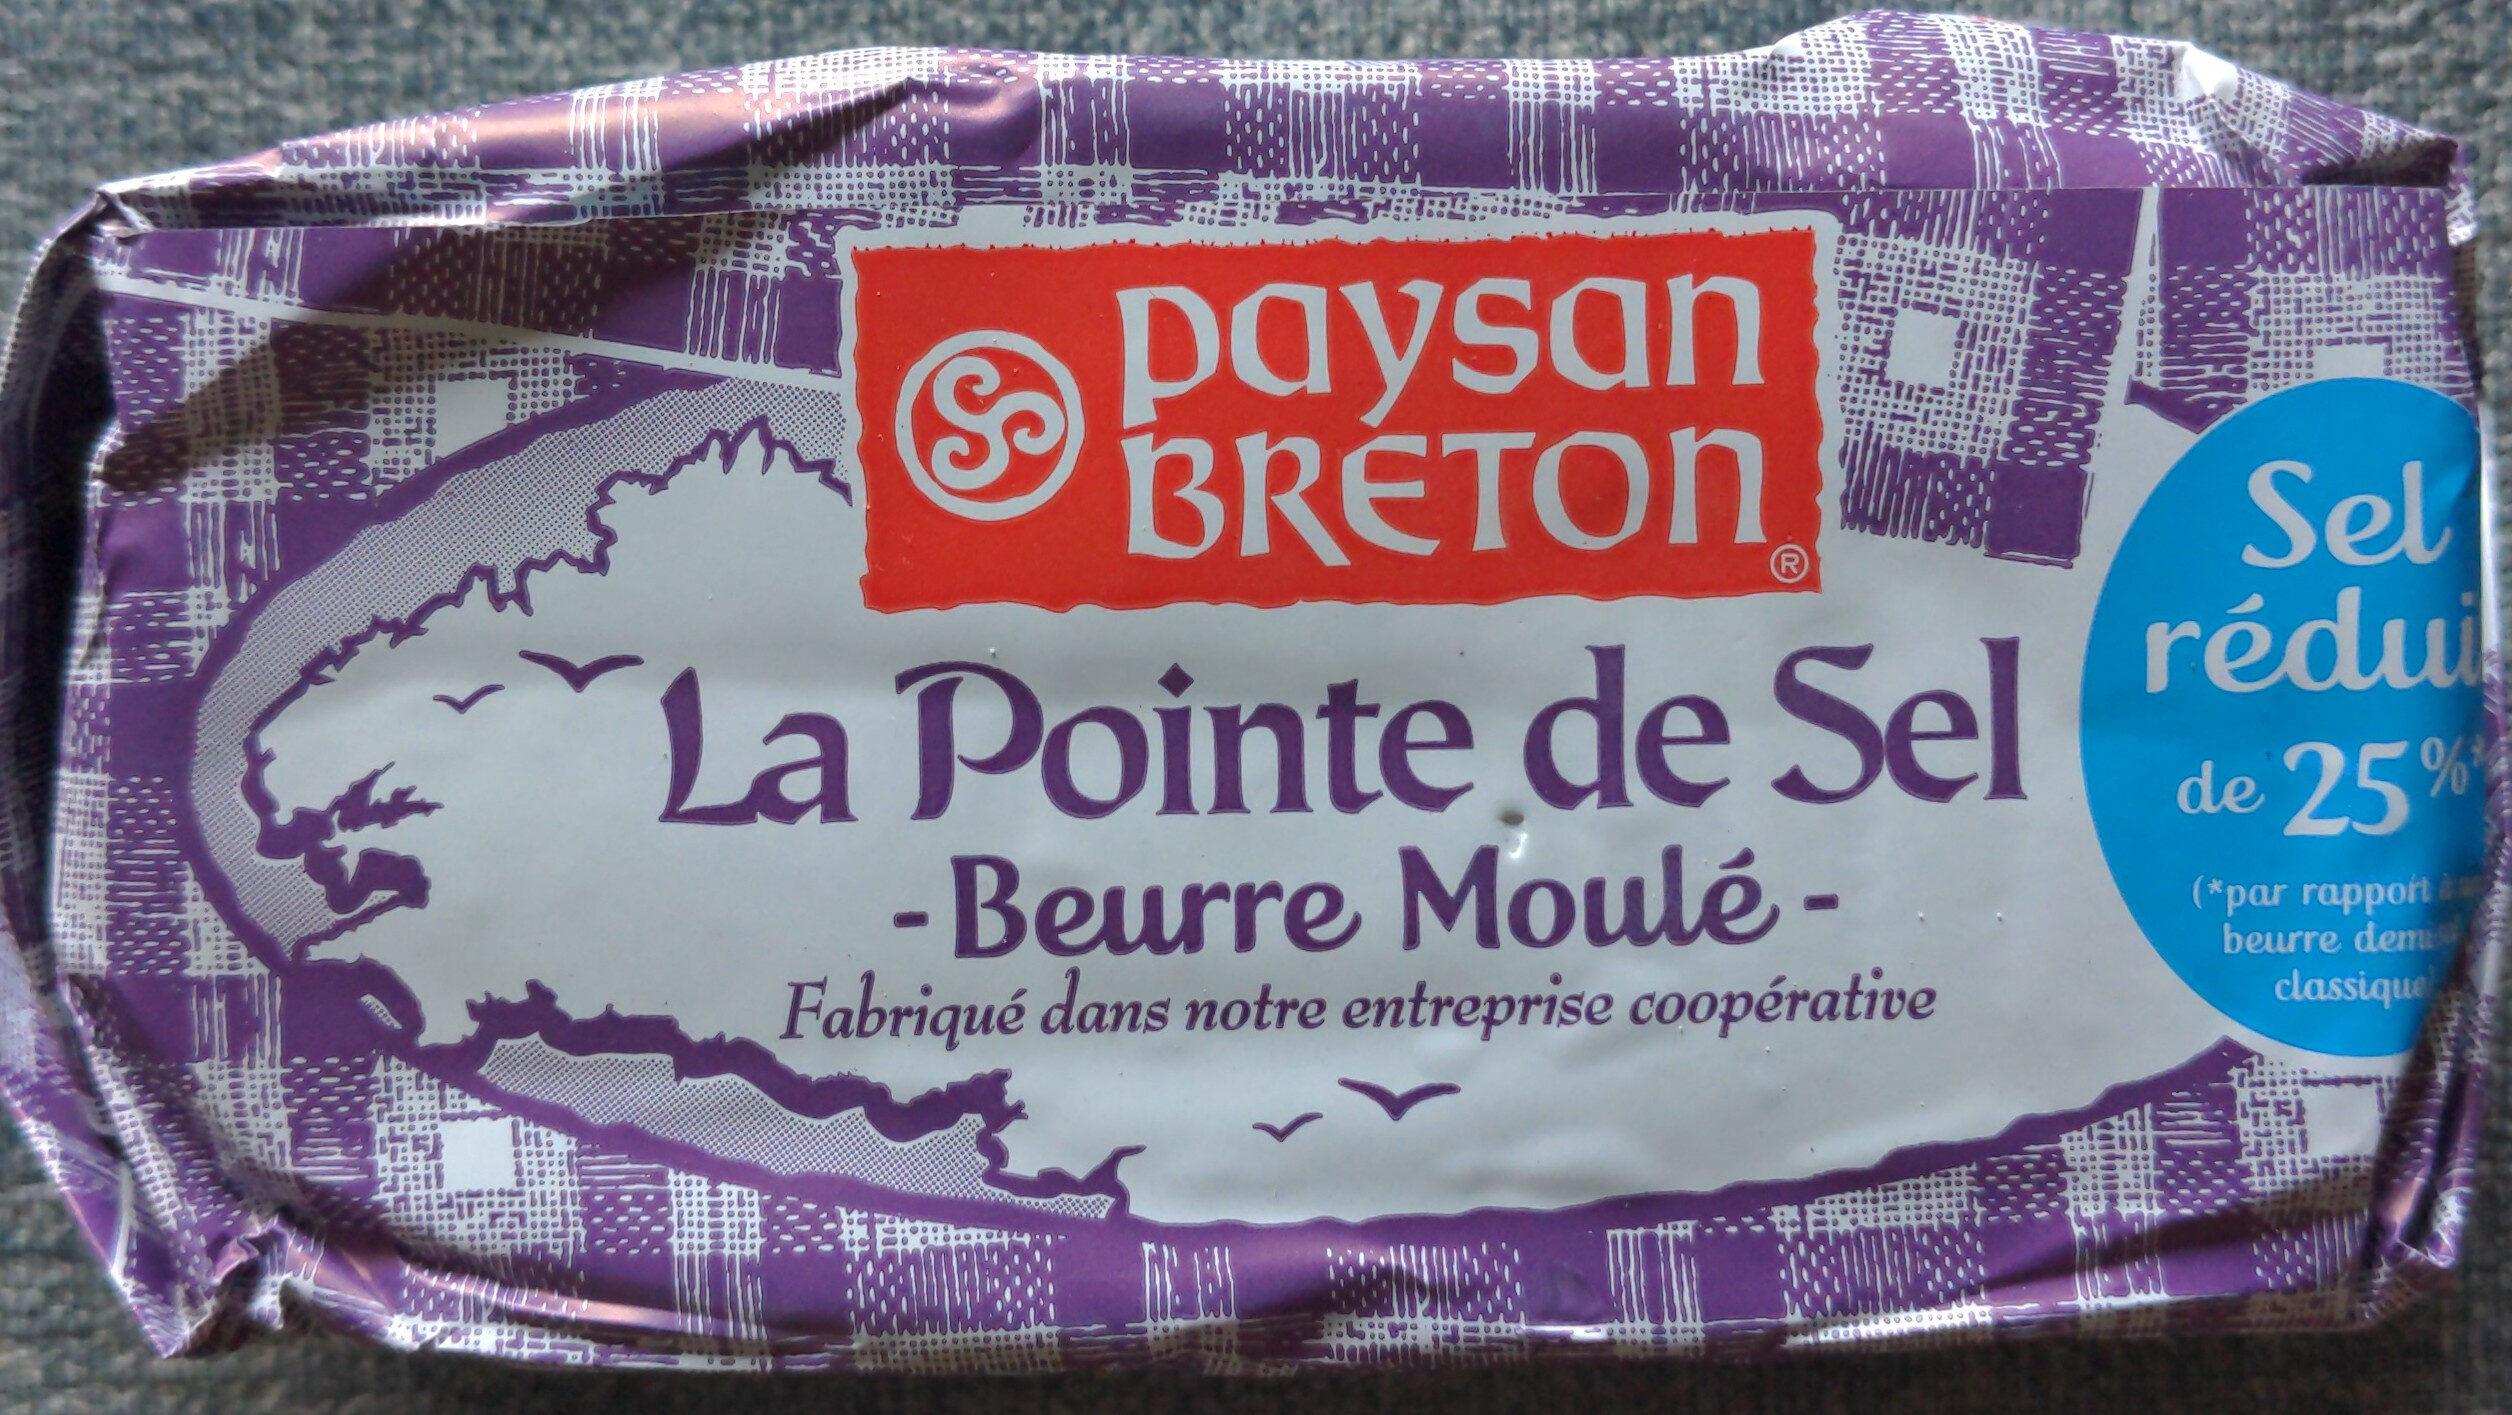 La pointe de Sel - Produit - fr